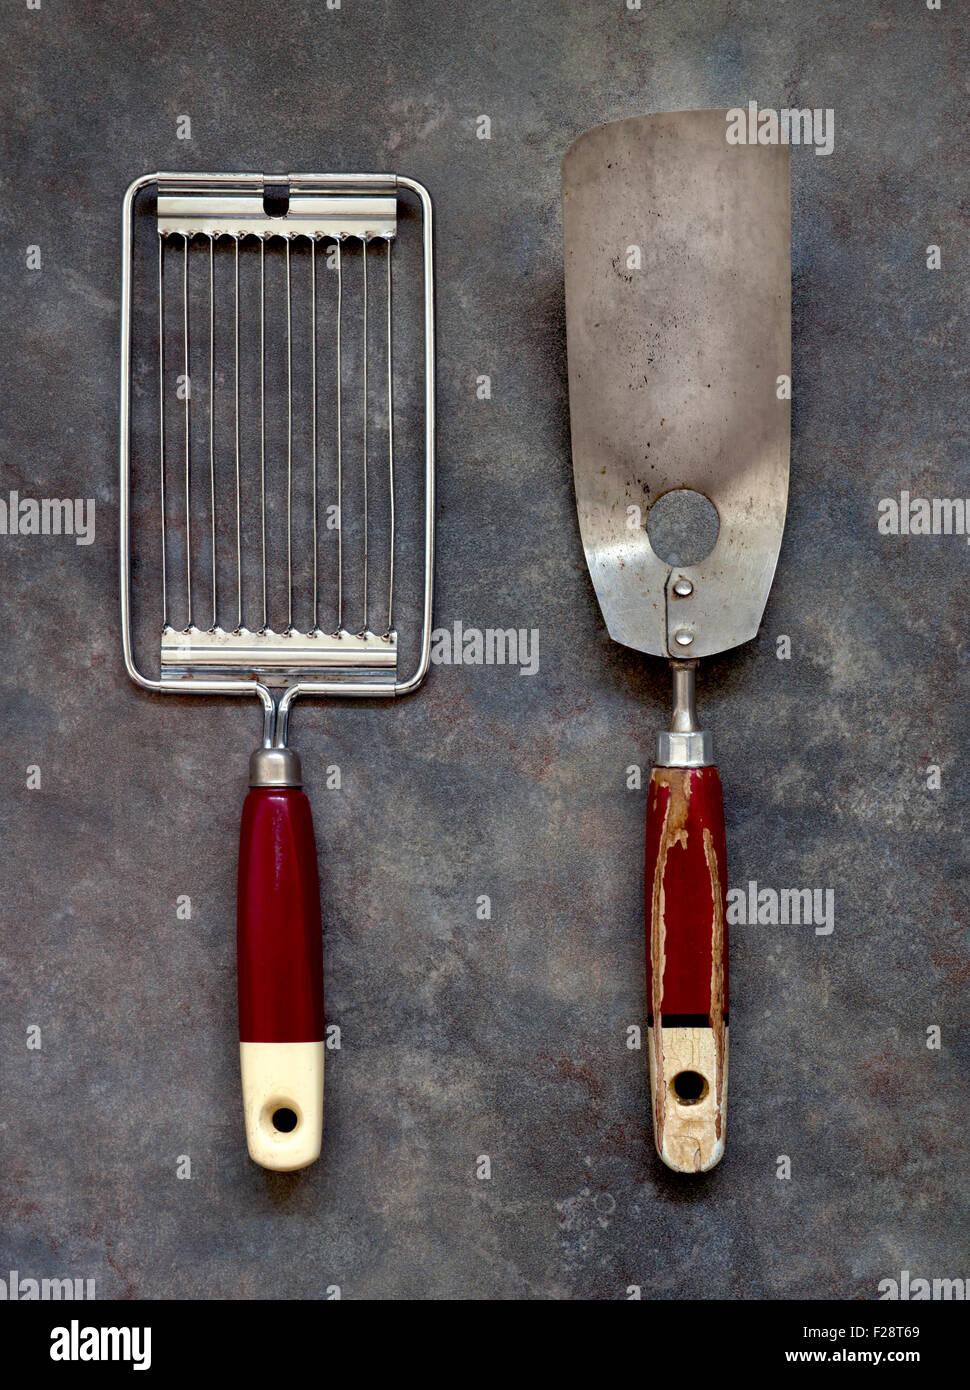 Vintage Kitchen Gadgets - Slicer and Spatula Stock Photo ...